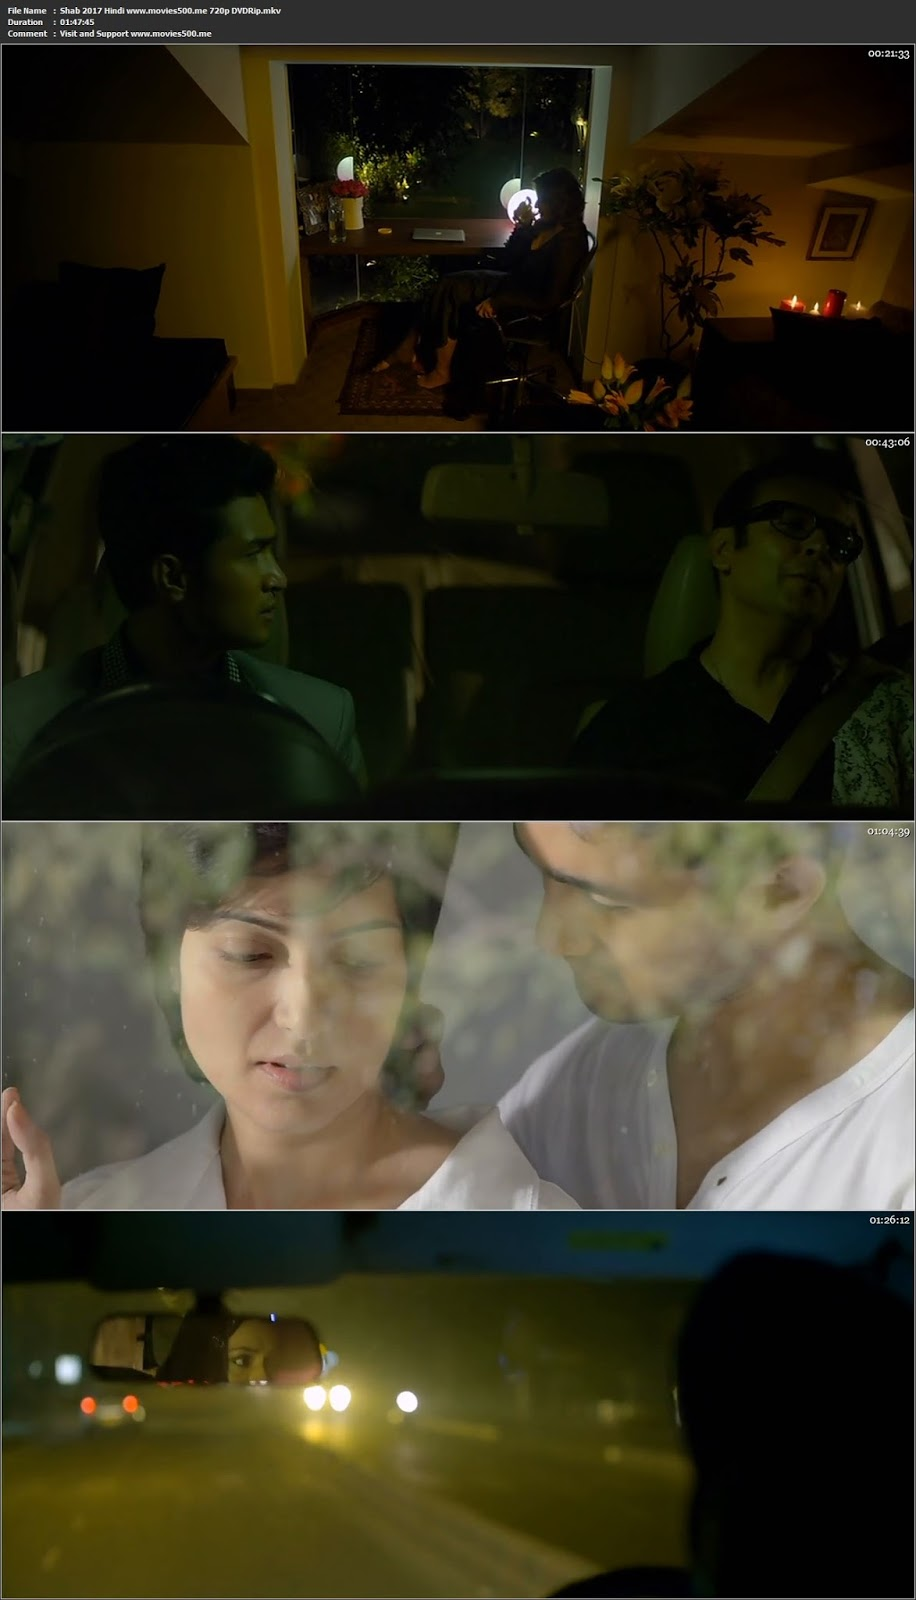 Shab 2017 Hindi Full Movie 800MB DVDRip 720p at freedomcopy.com